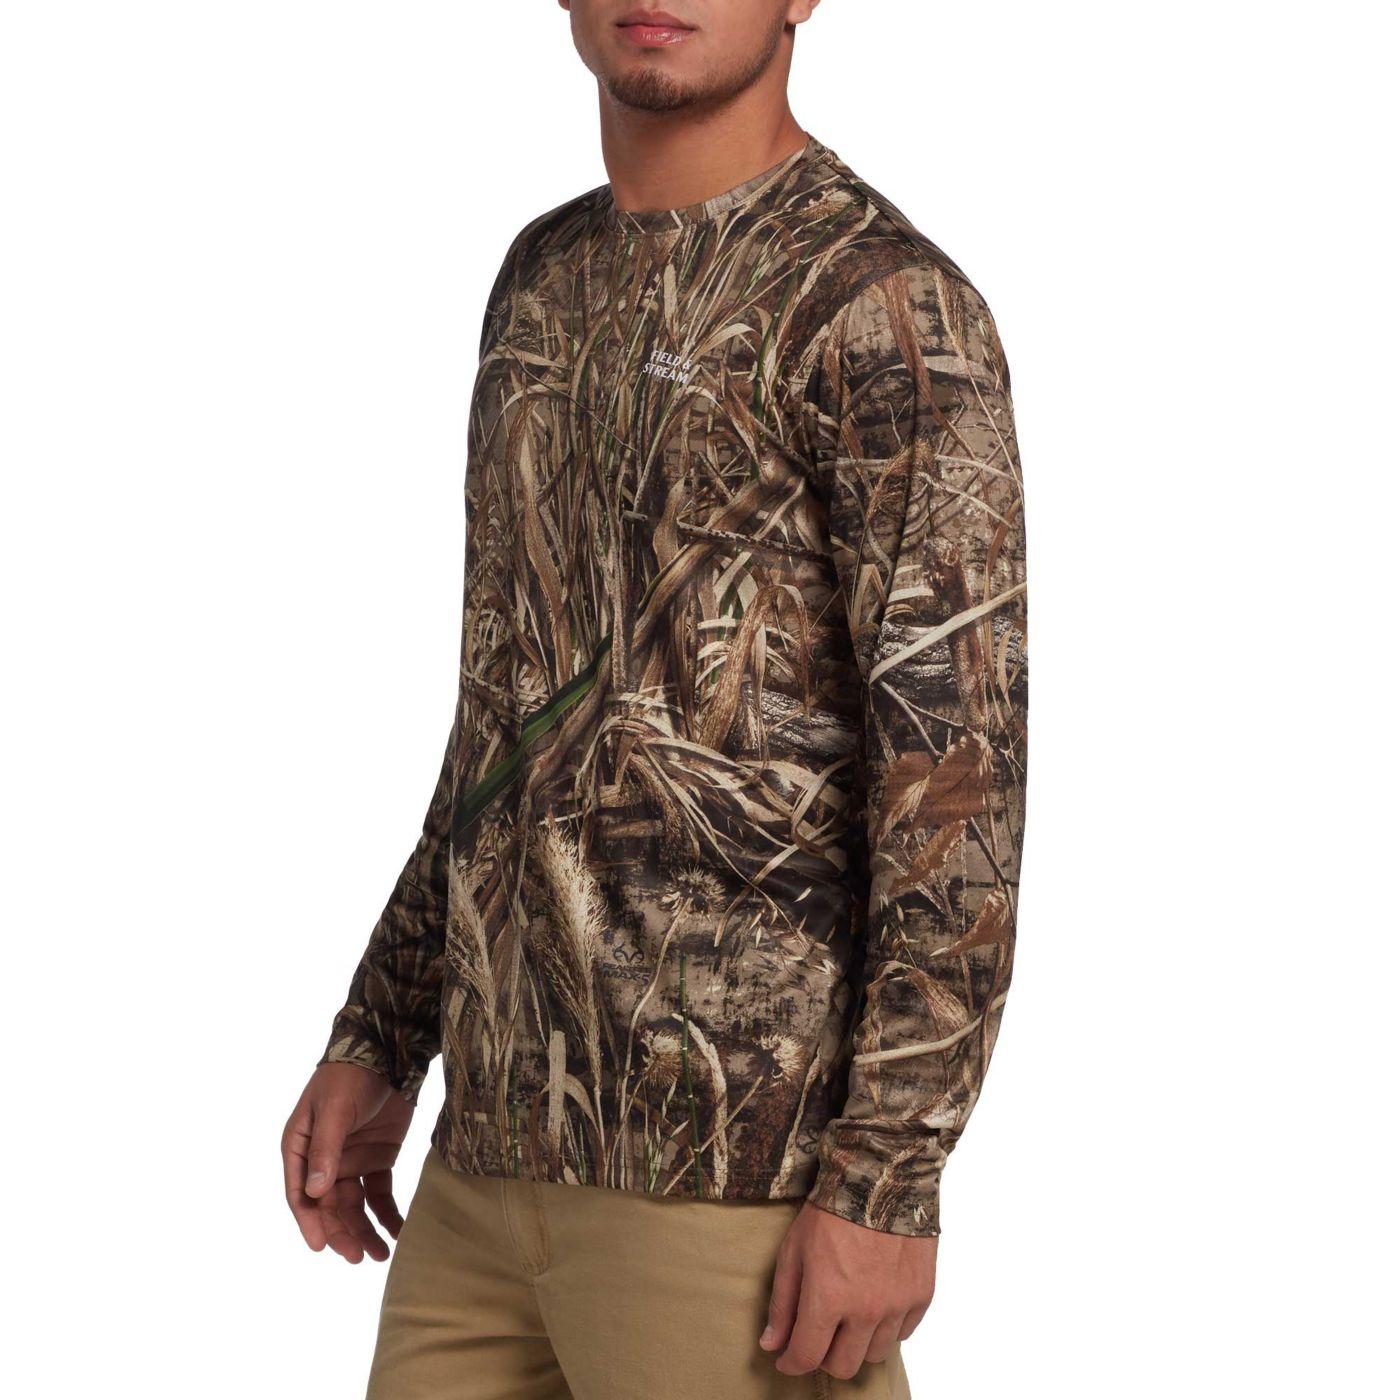 Field & Stream Men's Long Sleeve Tech Hunting T-Shirt